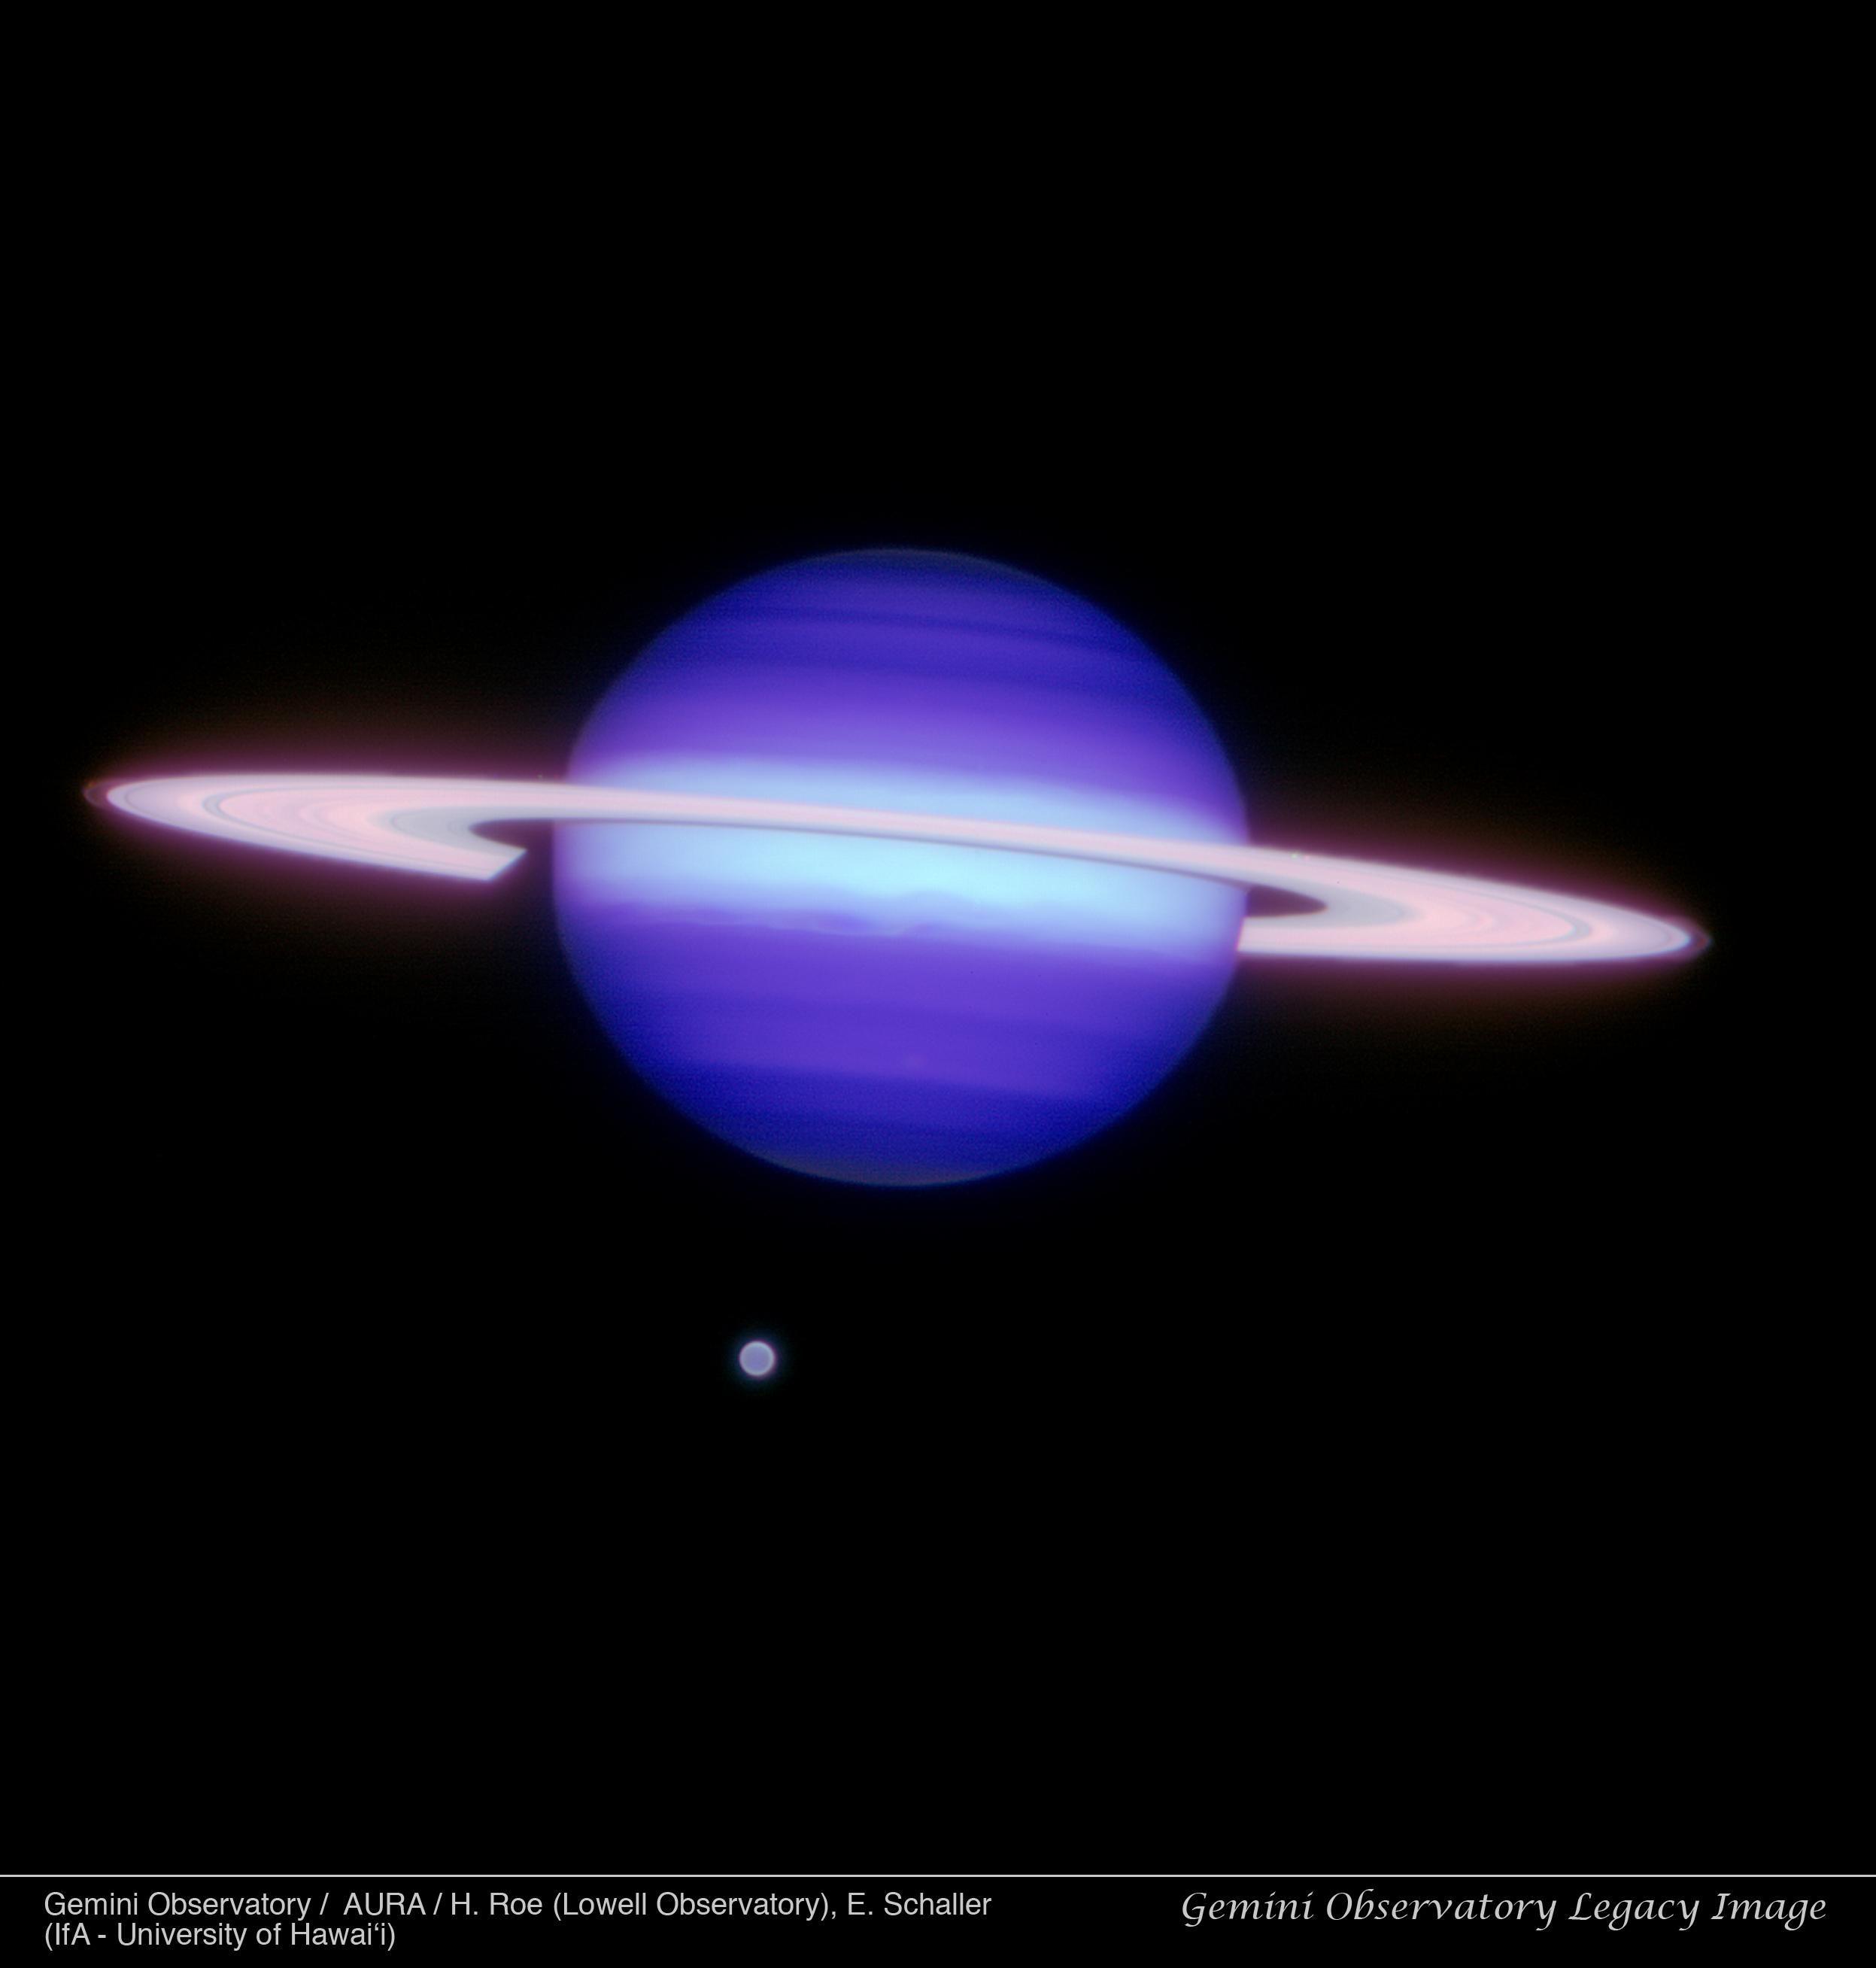 Saturn & Titan Gemini Image